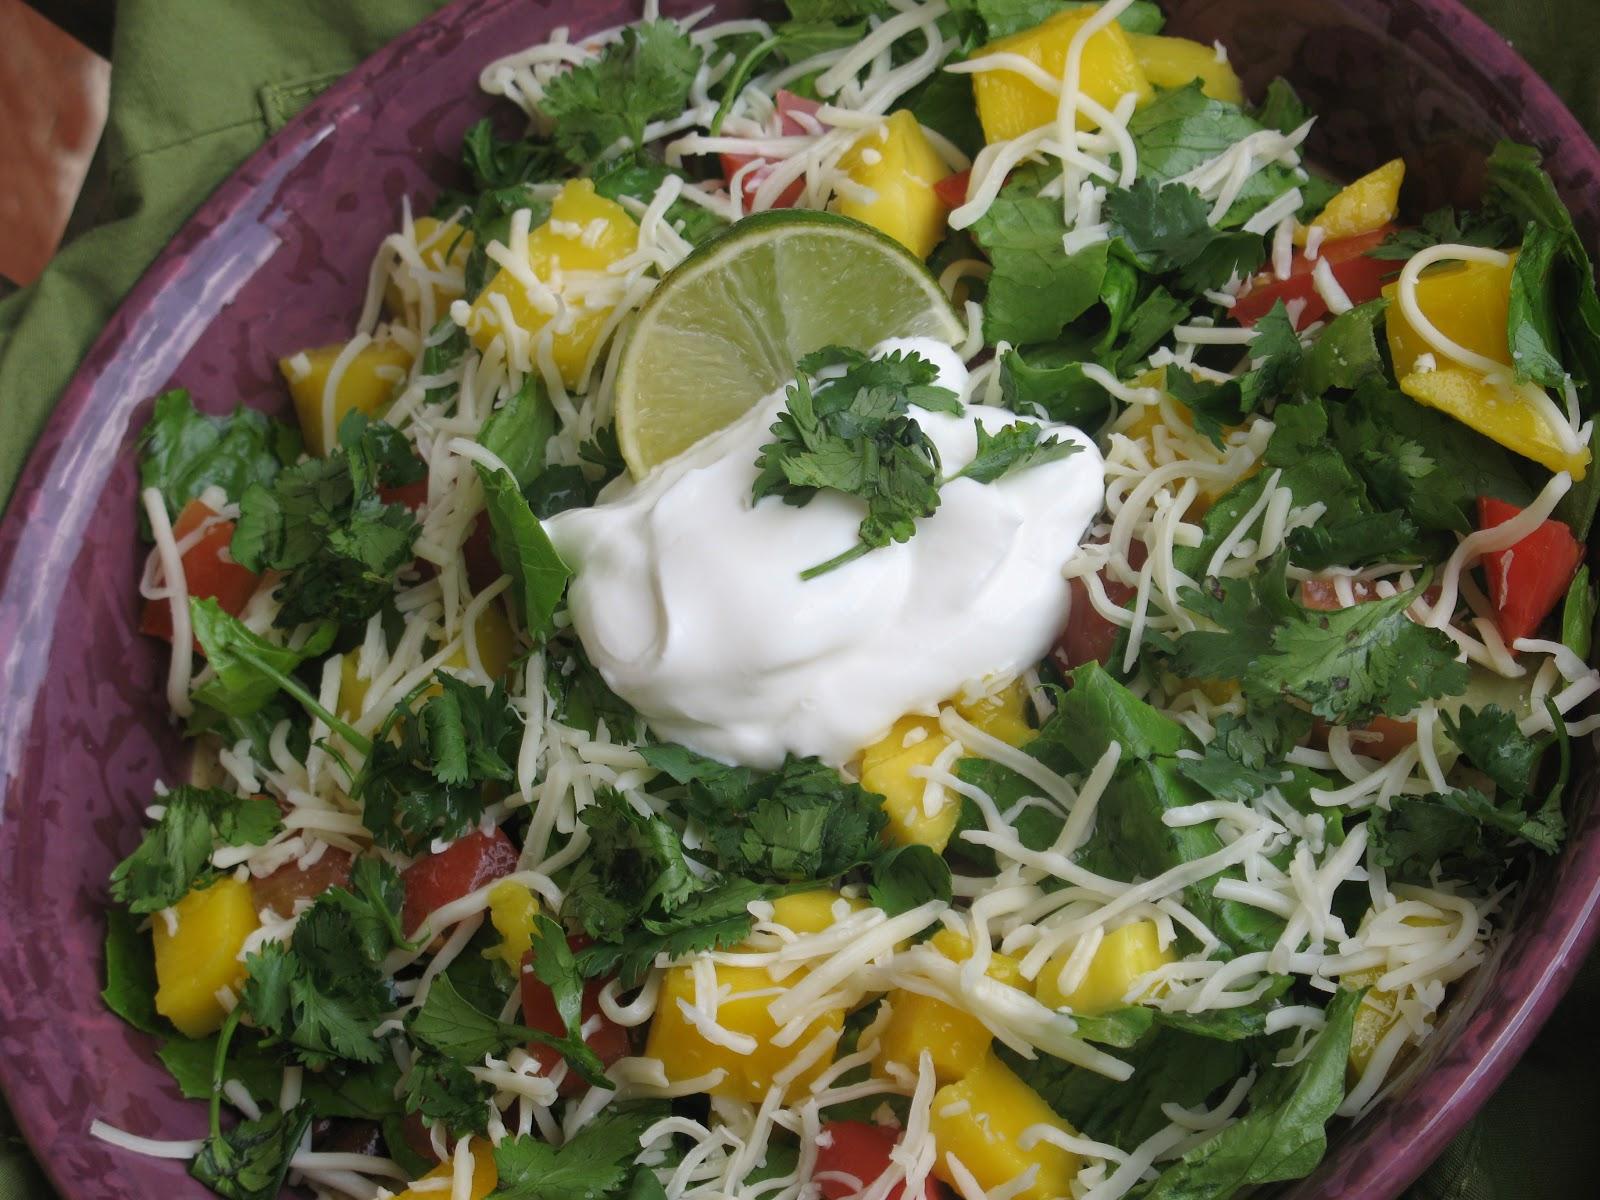 White Family Recipes: Black Bean & Mango Taco Salad